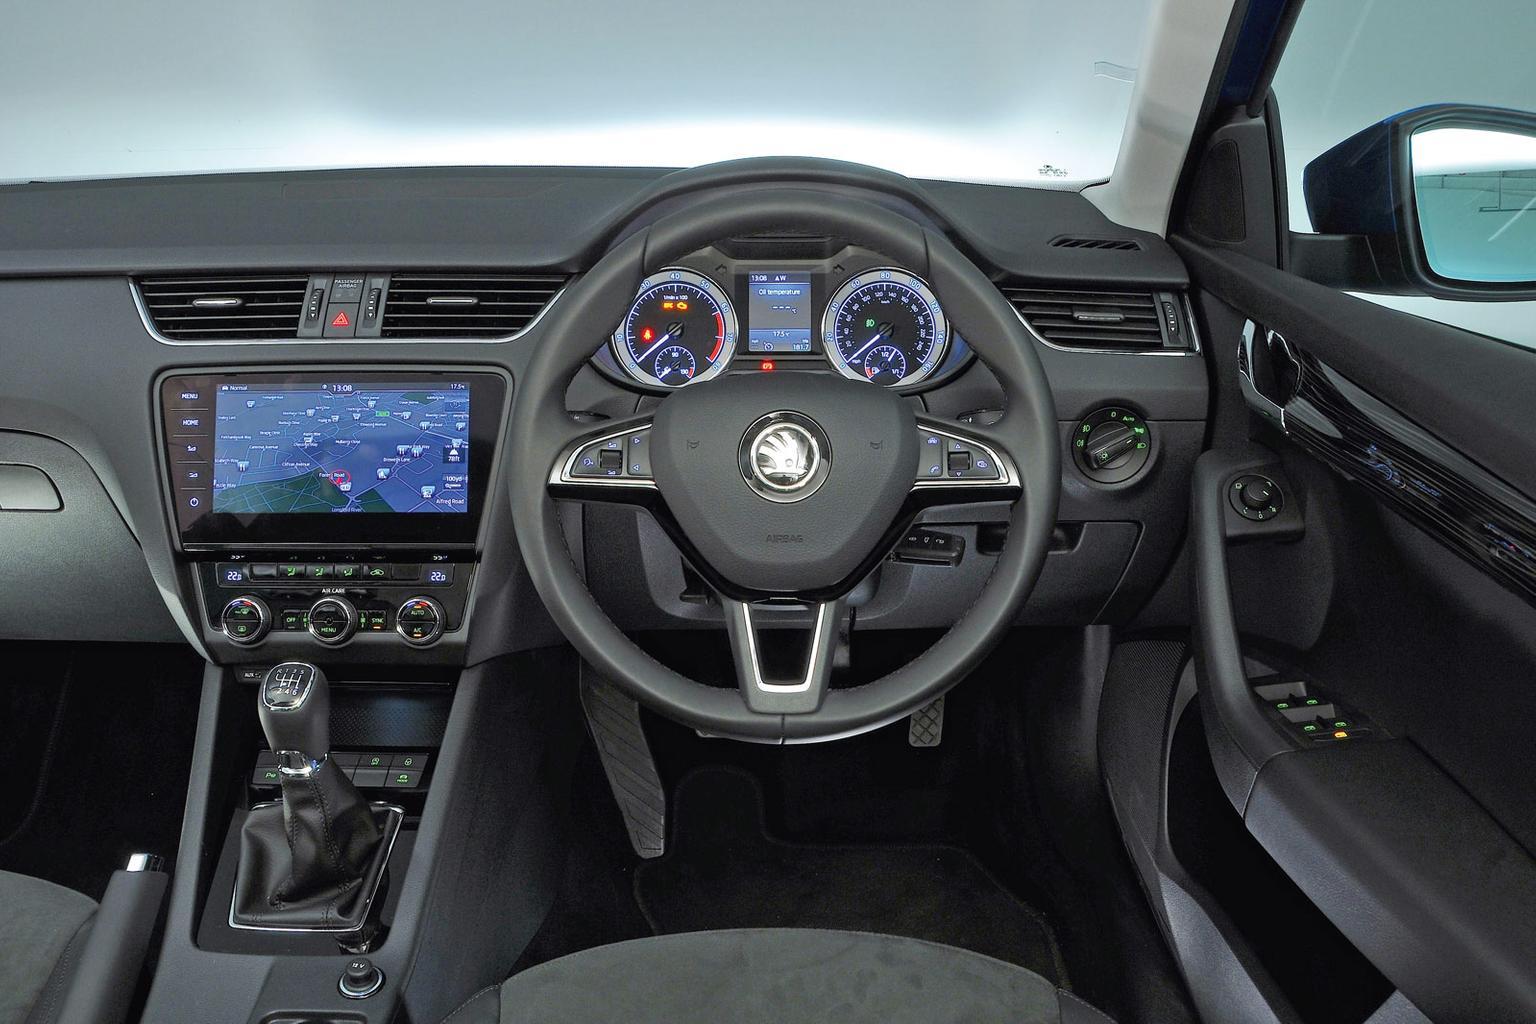 New Skoda Octavia & Volkswagen Golf vs Peugeot 308